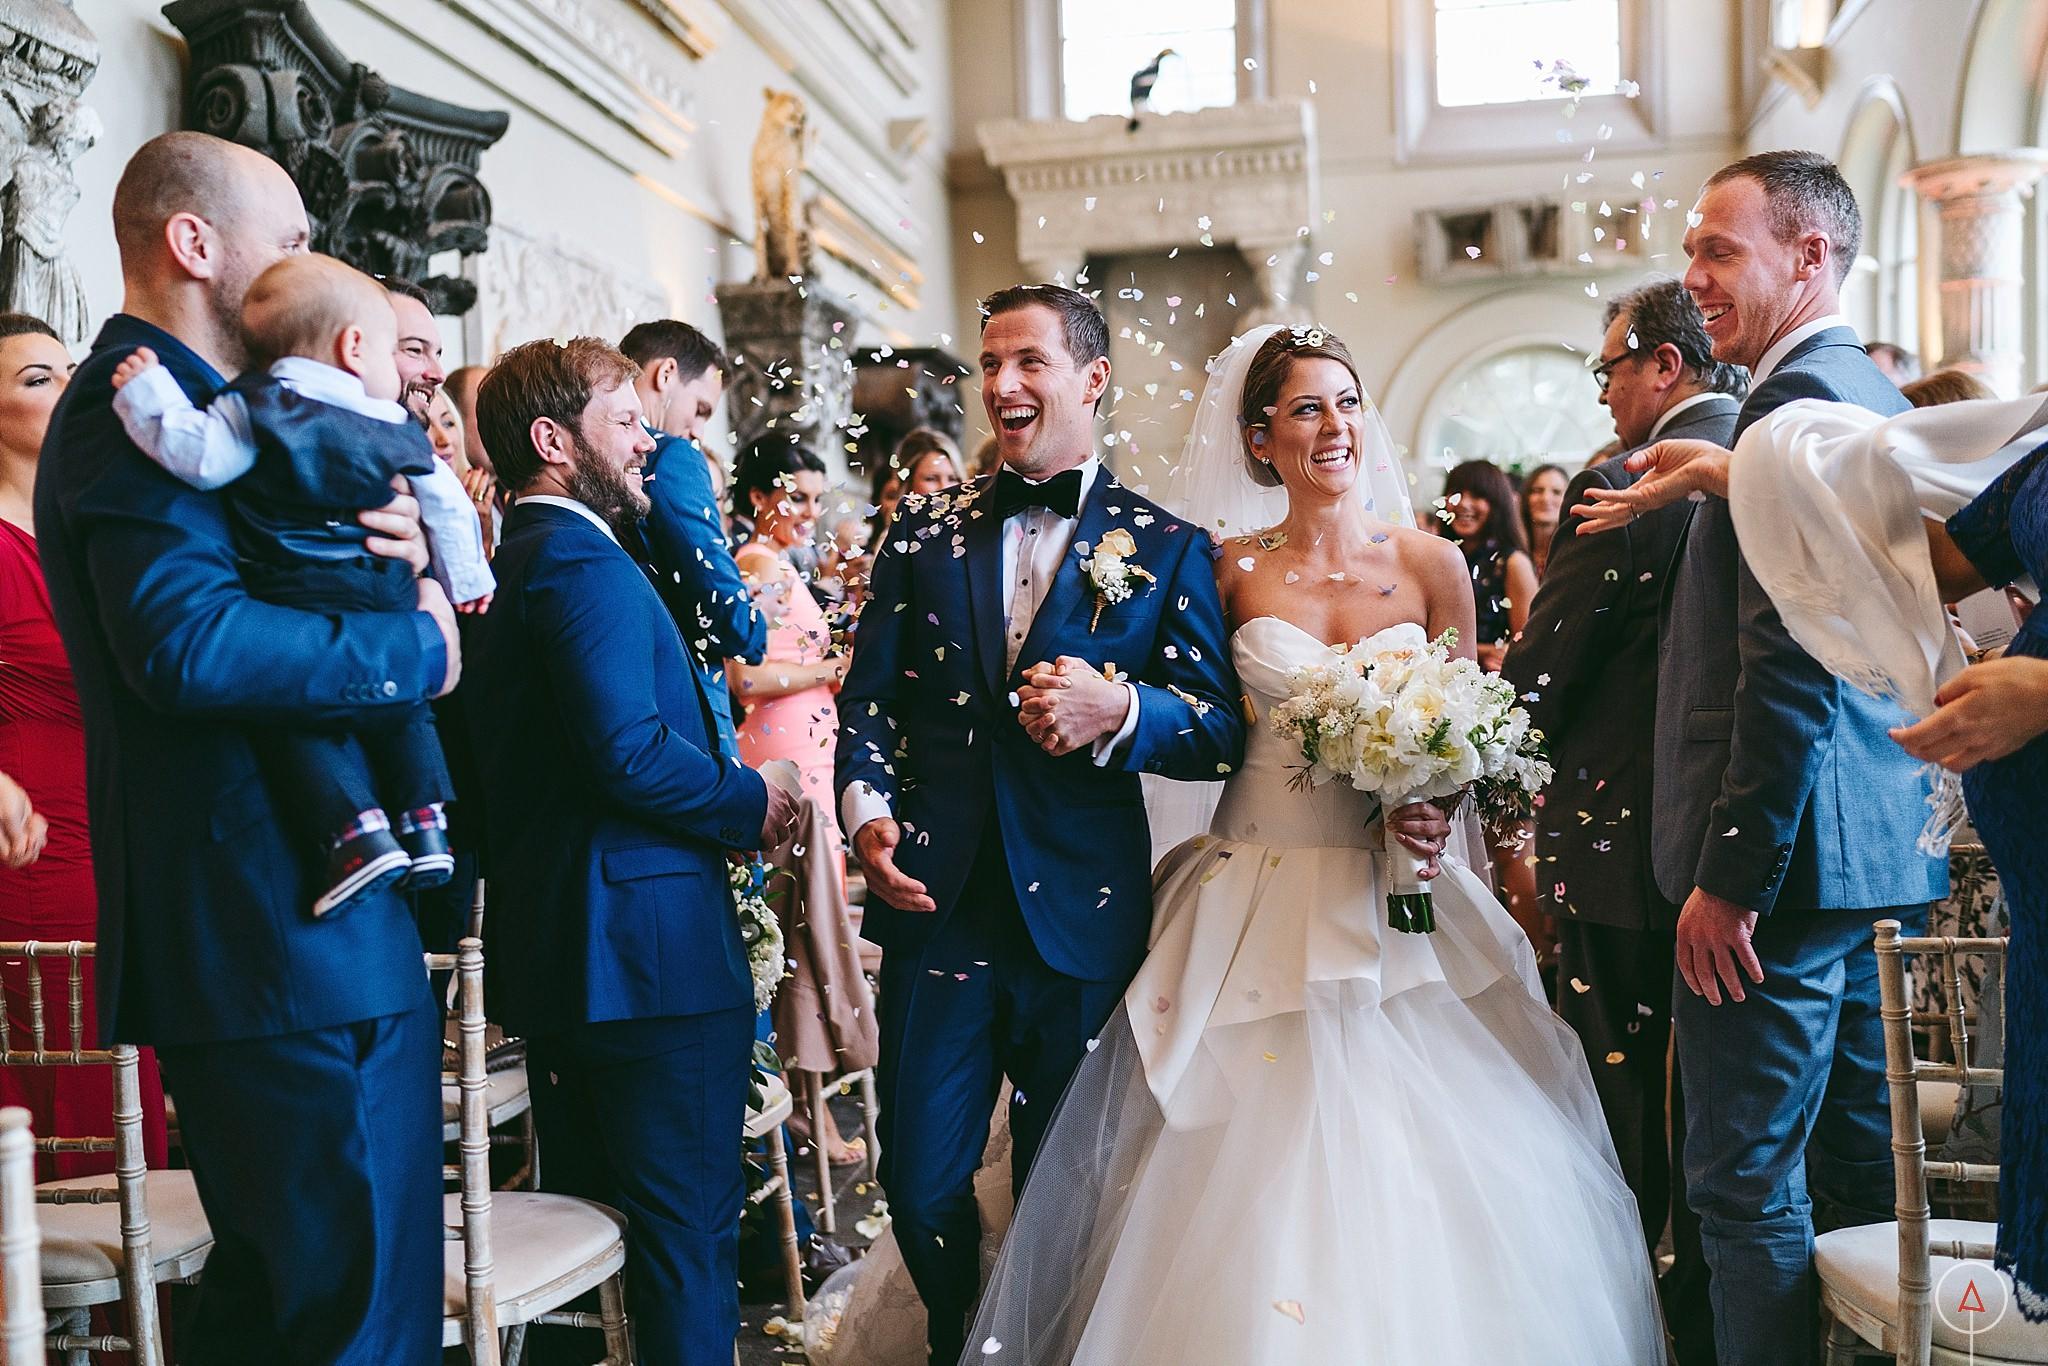 cardiff-wedding-photographer-aga-tomaszek_0258